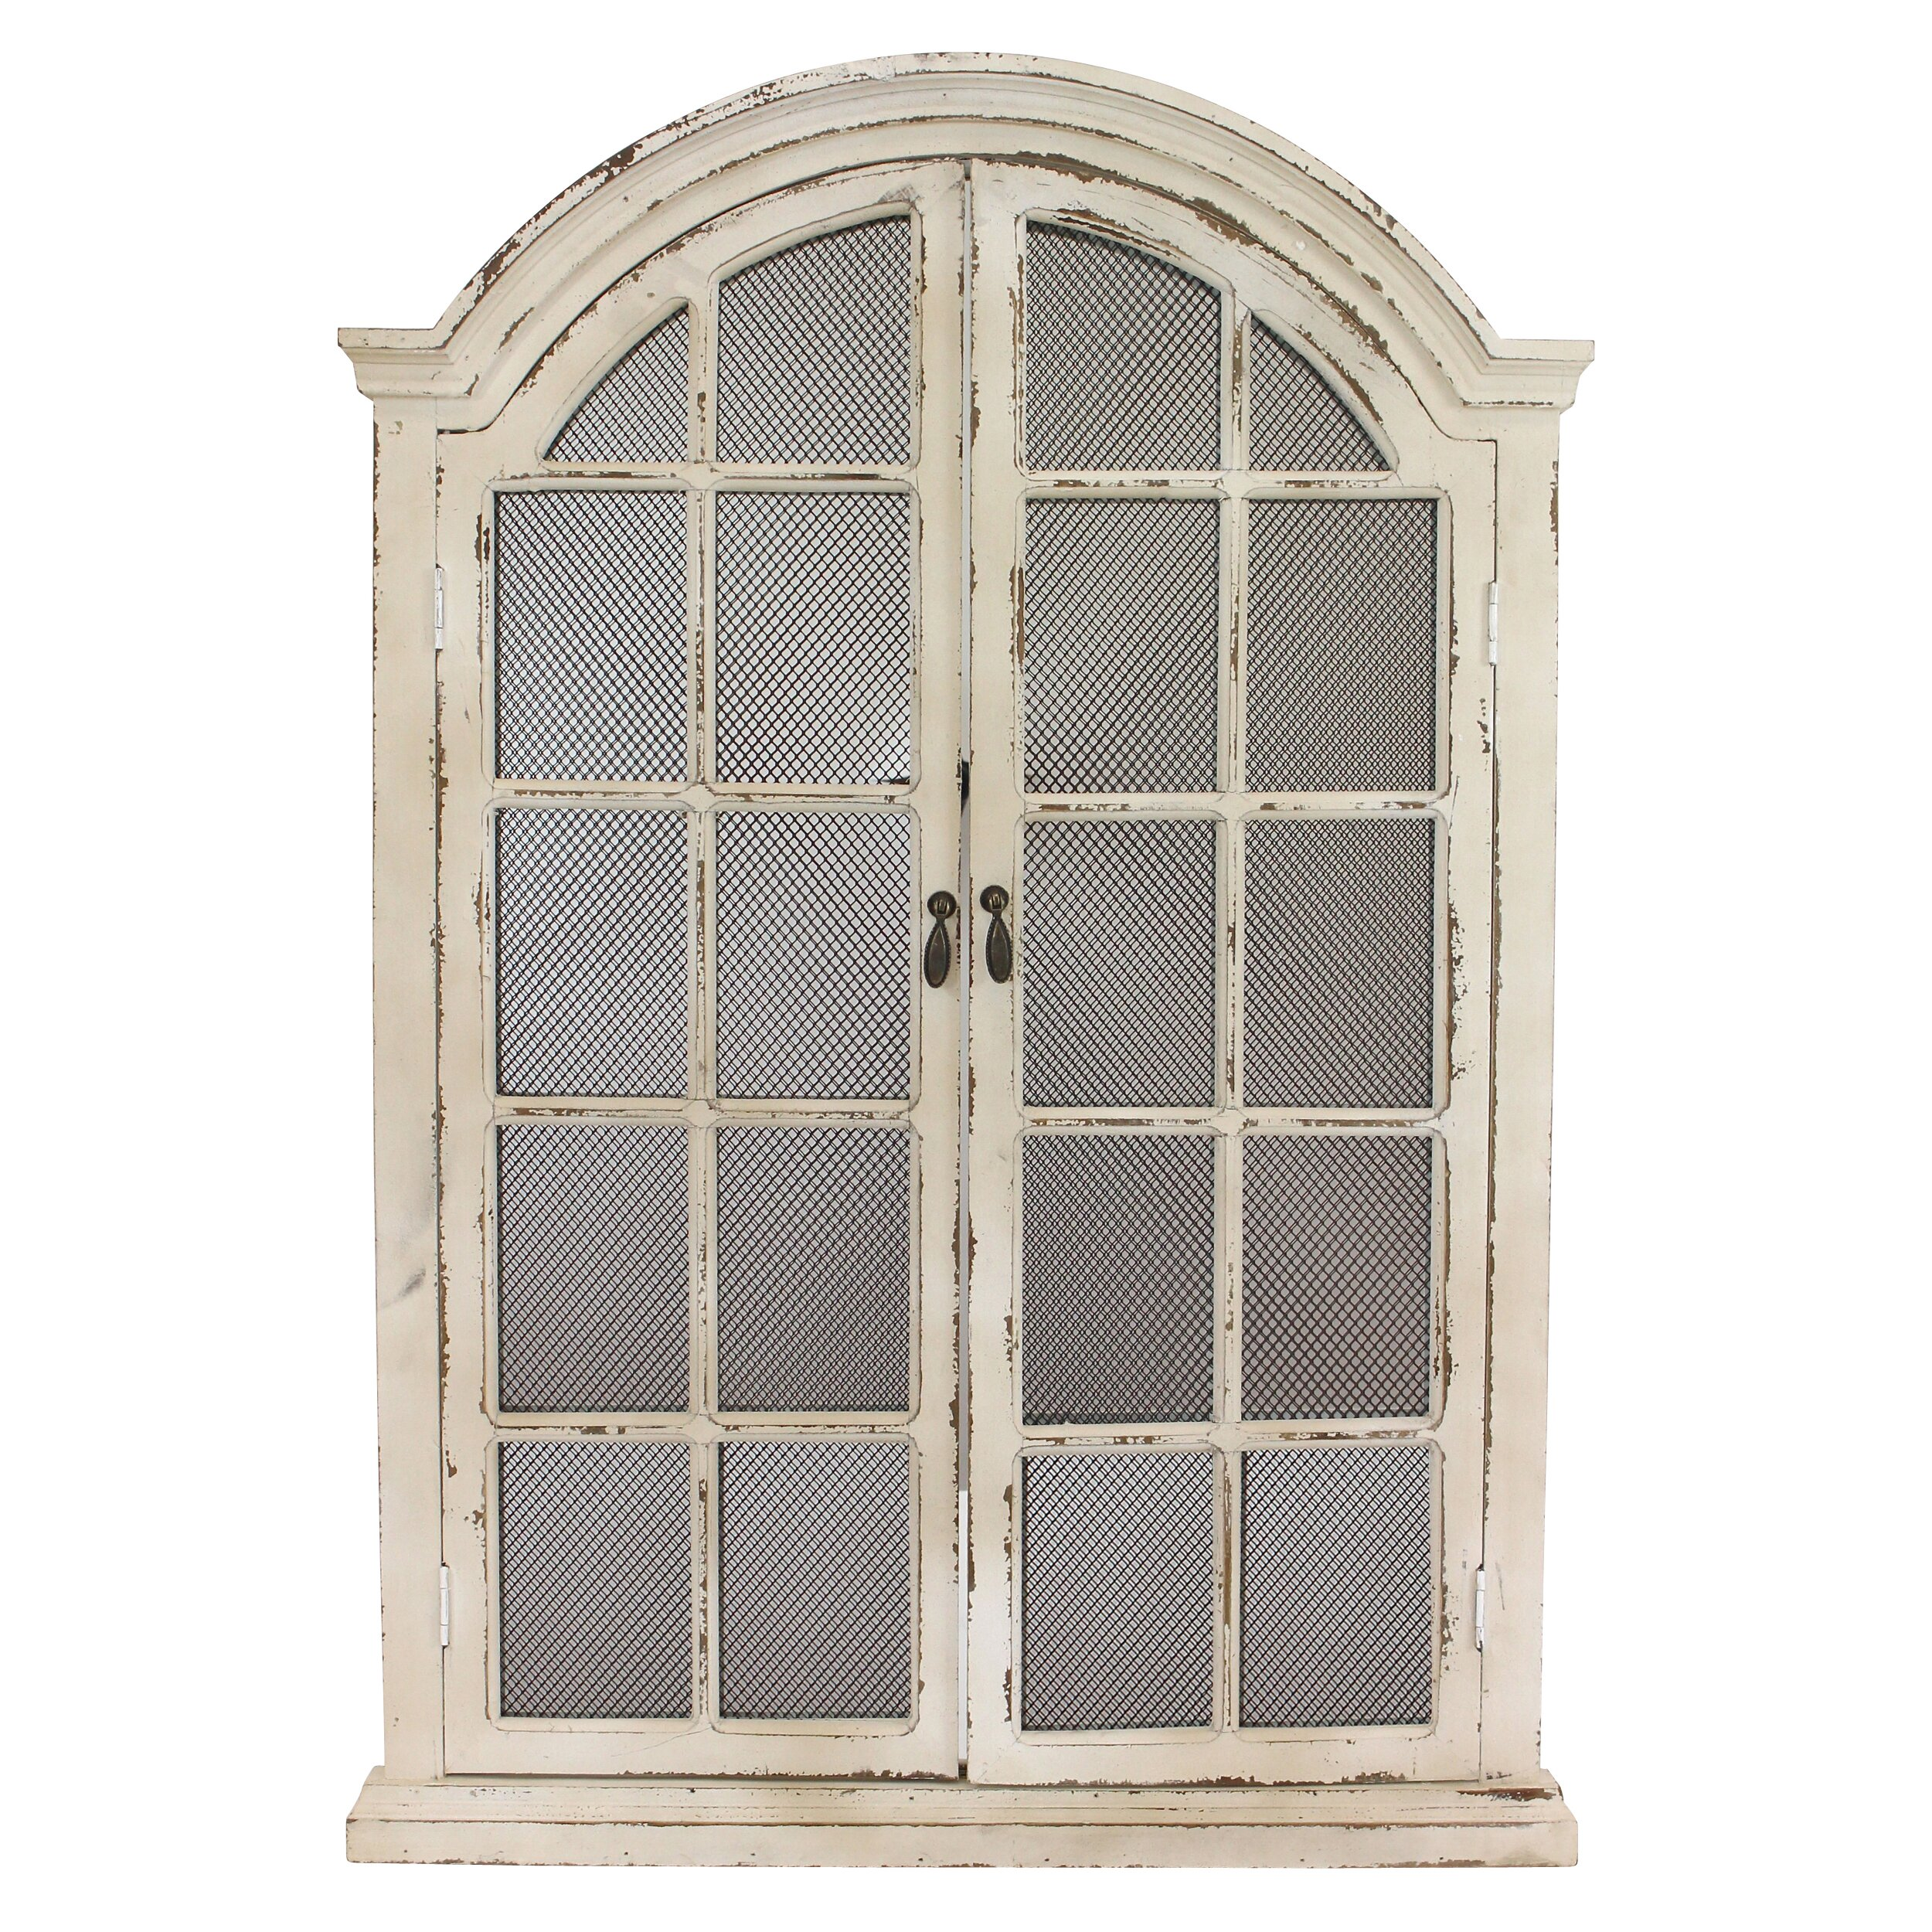 Aspire emily window wall mirror reviews wayfair for Window wall mirror